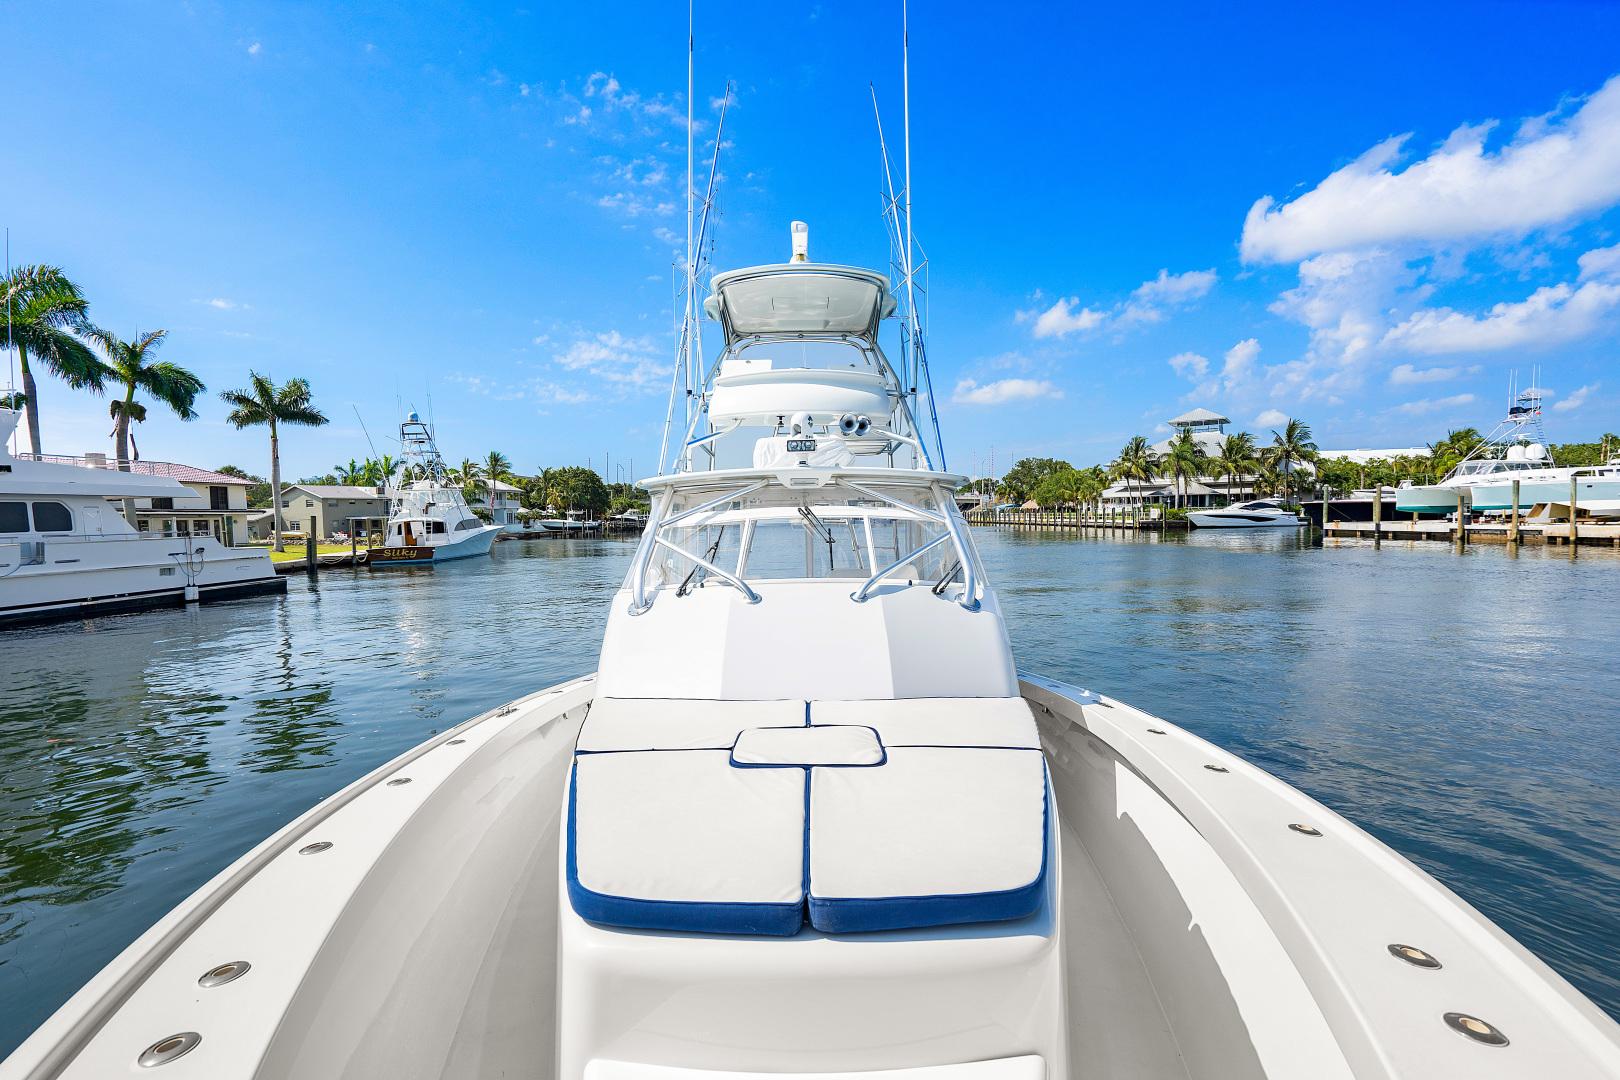 Release-Walkaround 2014-De Bowat Palm Beach Gardens-United States-1364499 | Thumbnail